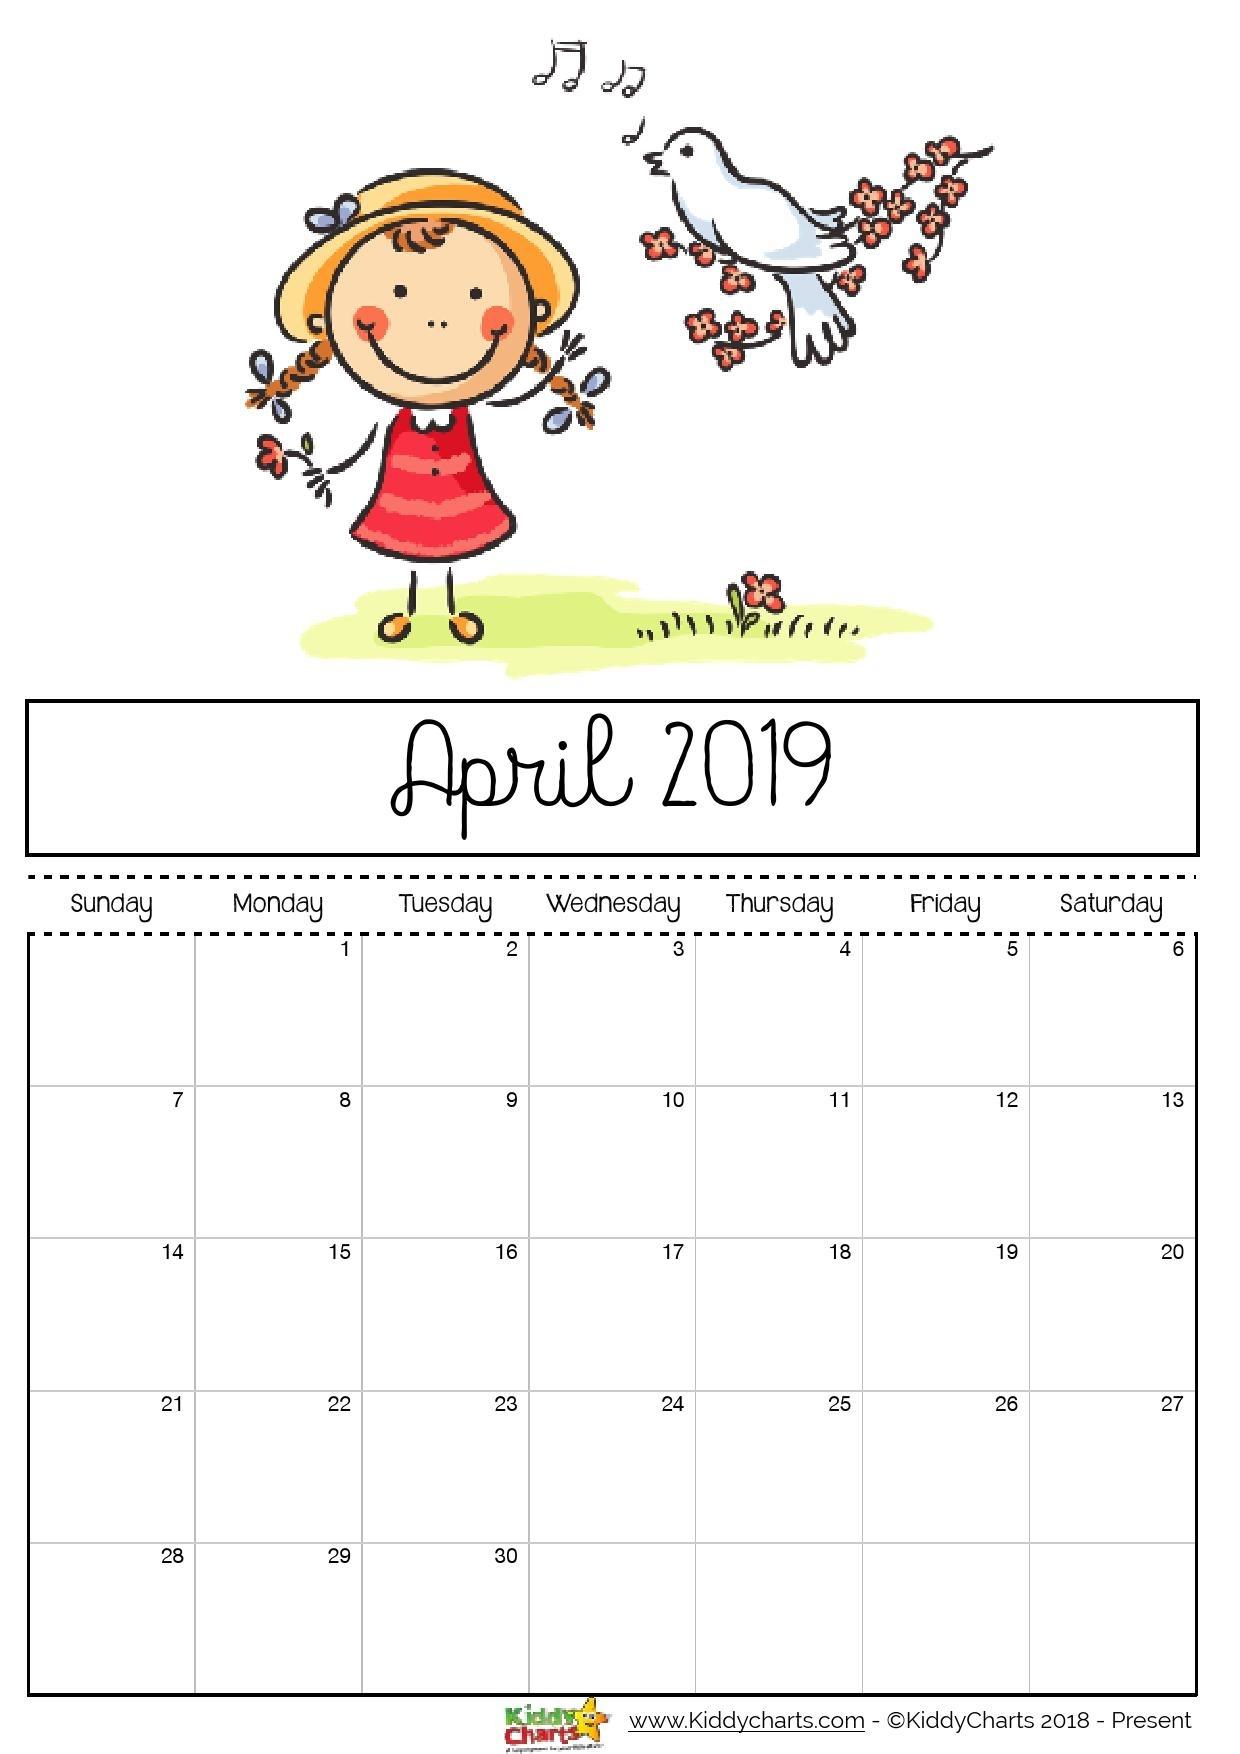 Free Printable 2019 Calendar For Kids Printable Calendar 2019 Cute